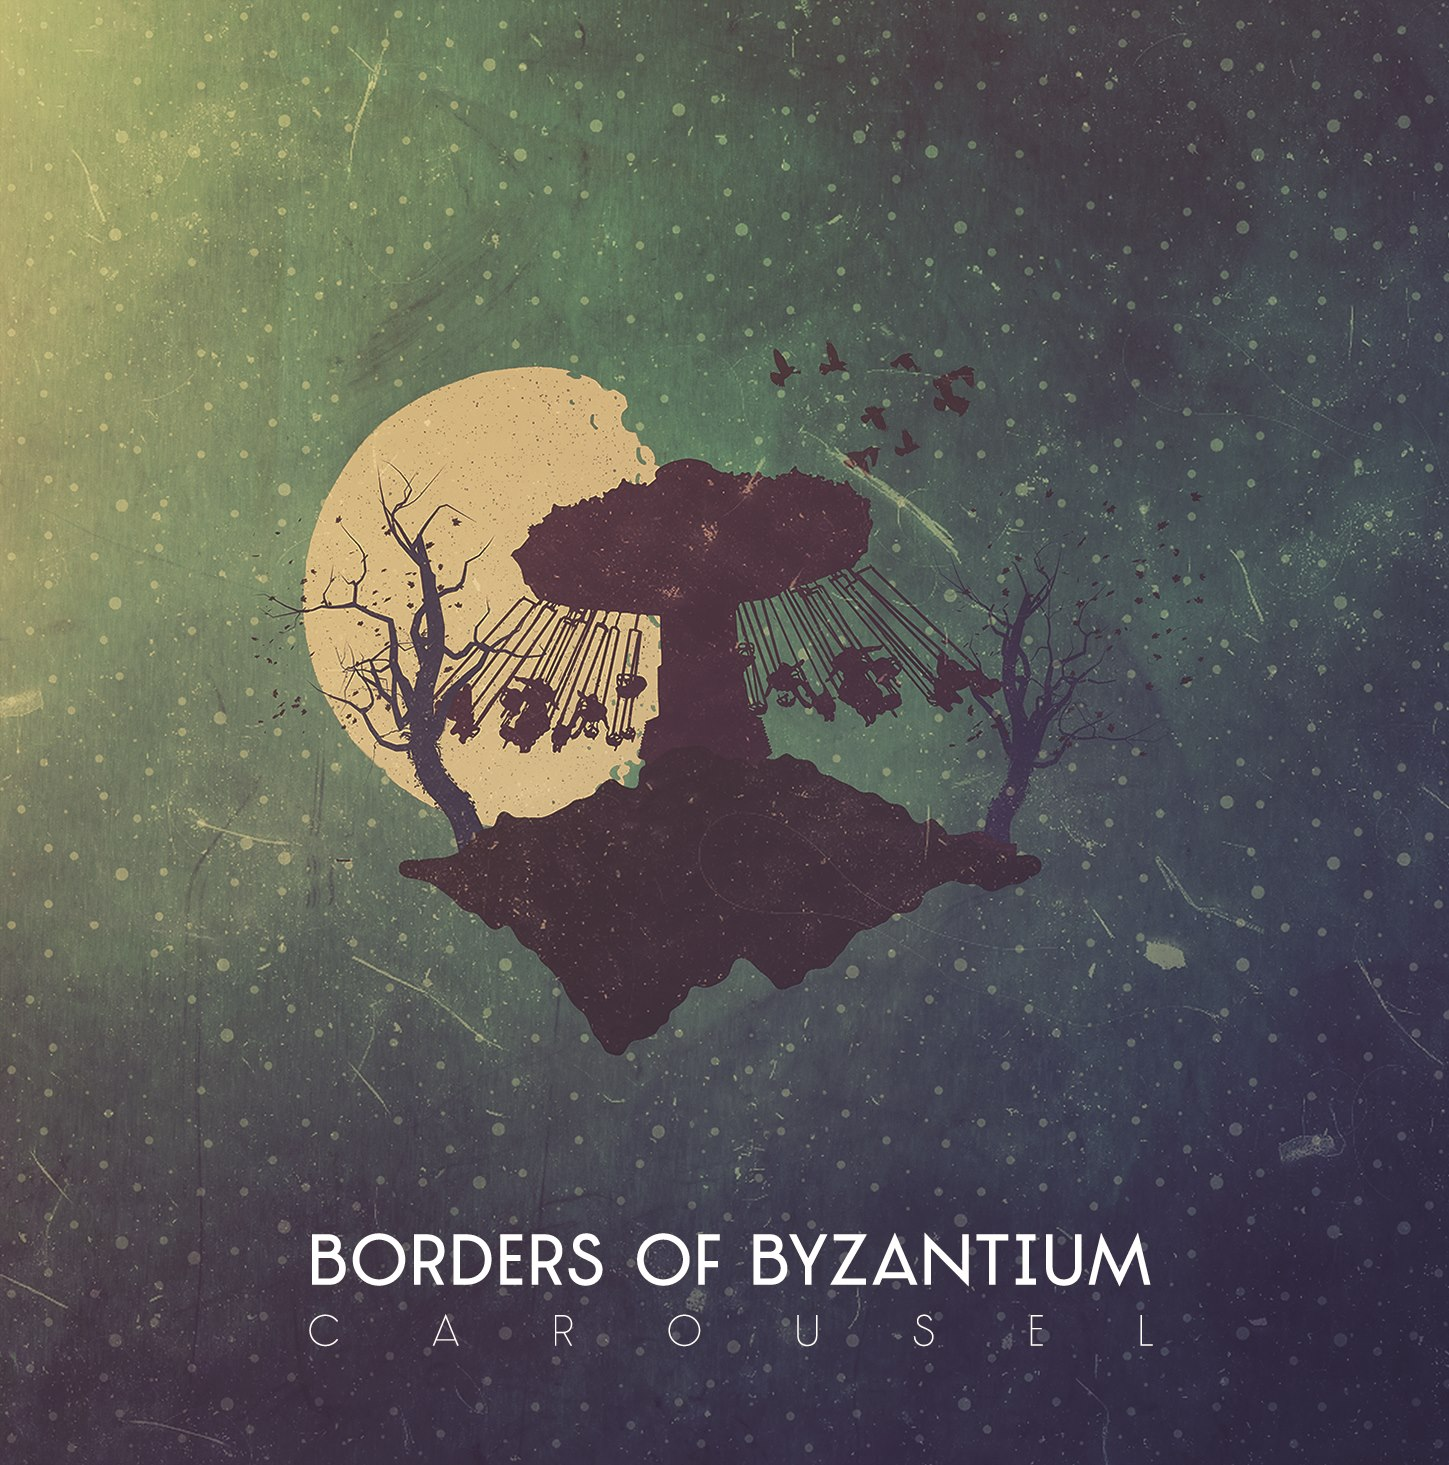 Borders of Byzantium - Carousel [EP] (2016)